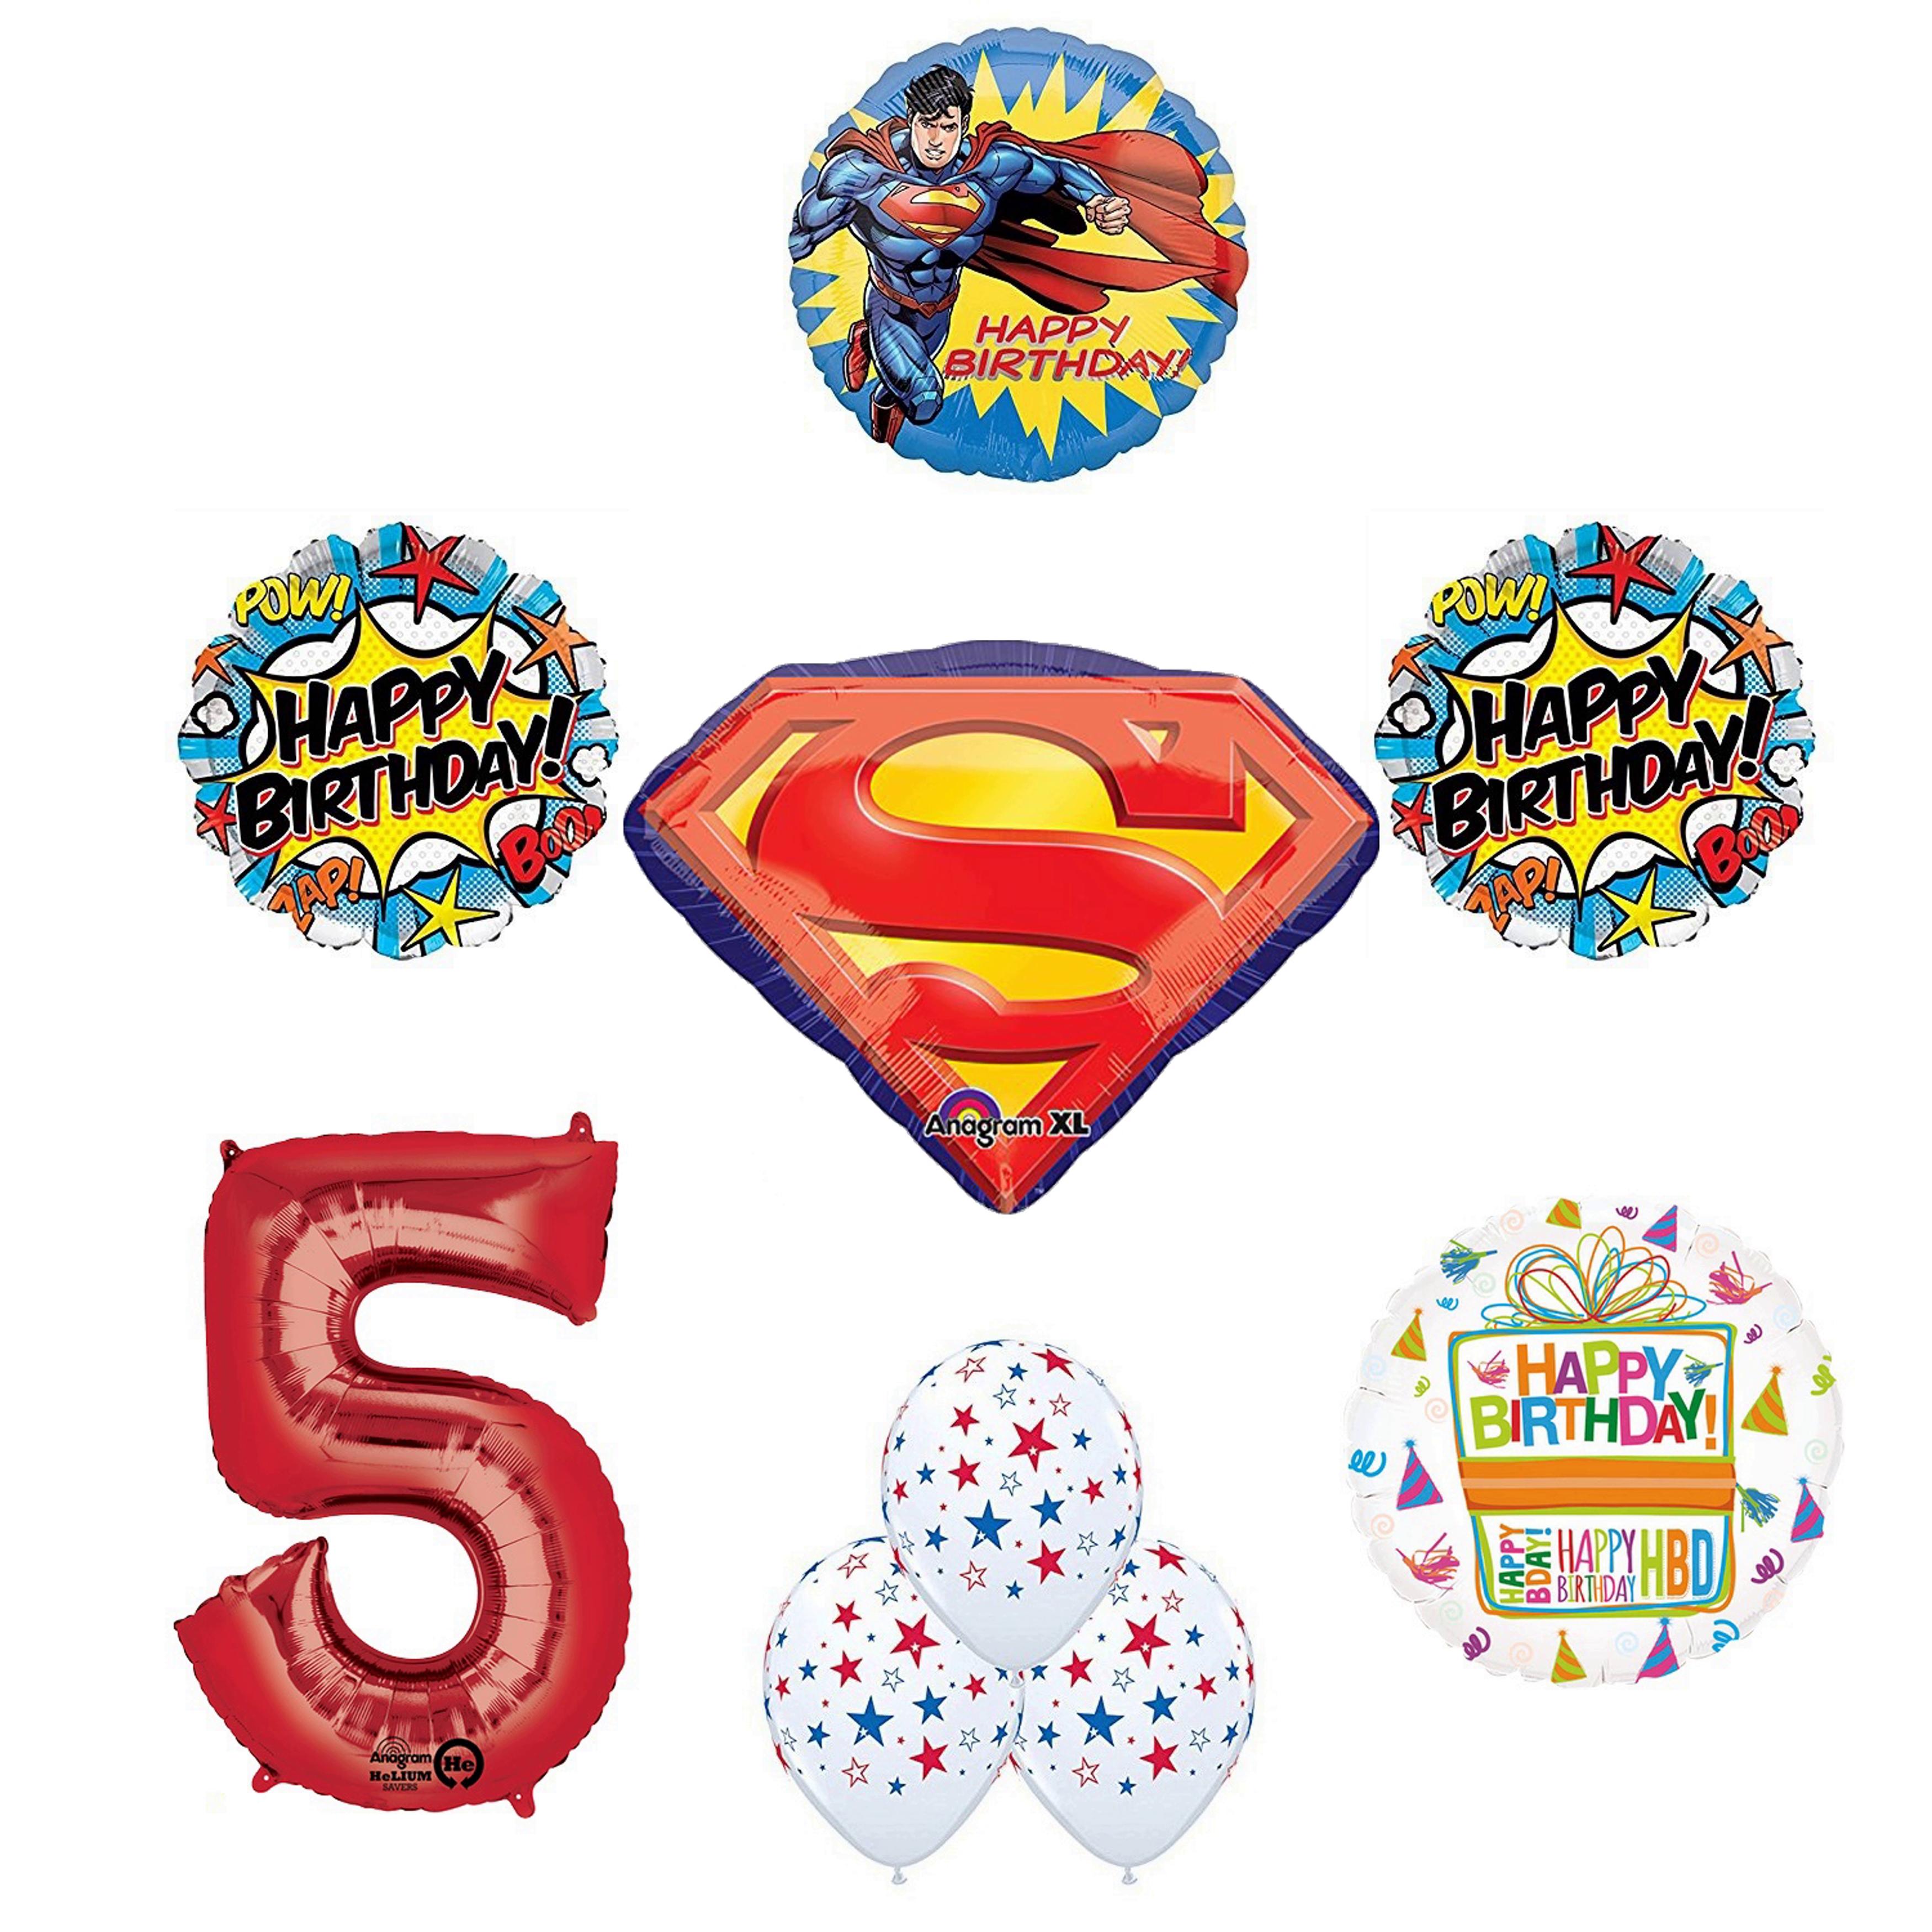 27pcsset US-Captain Balloons Birthday Party 18inch Super Hero Balloon Decor 12inch Polka Dot Latex Balloonn Party Supplies